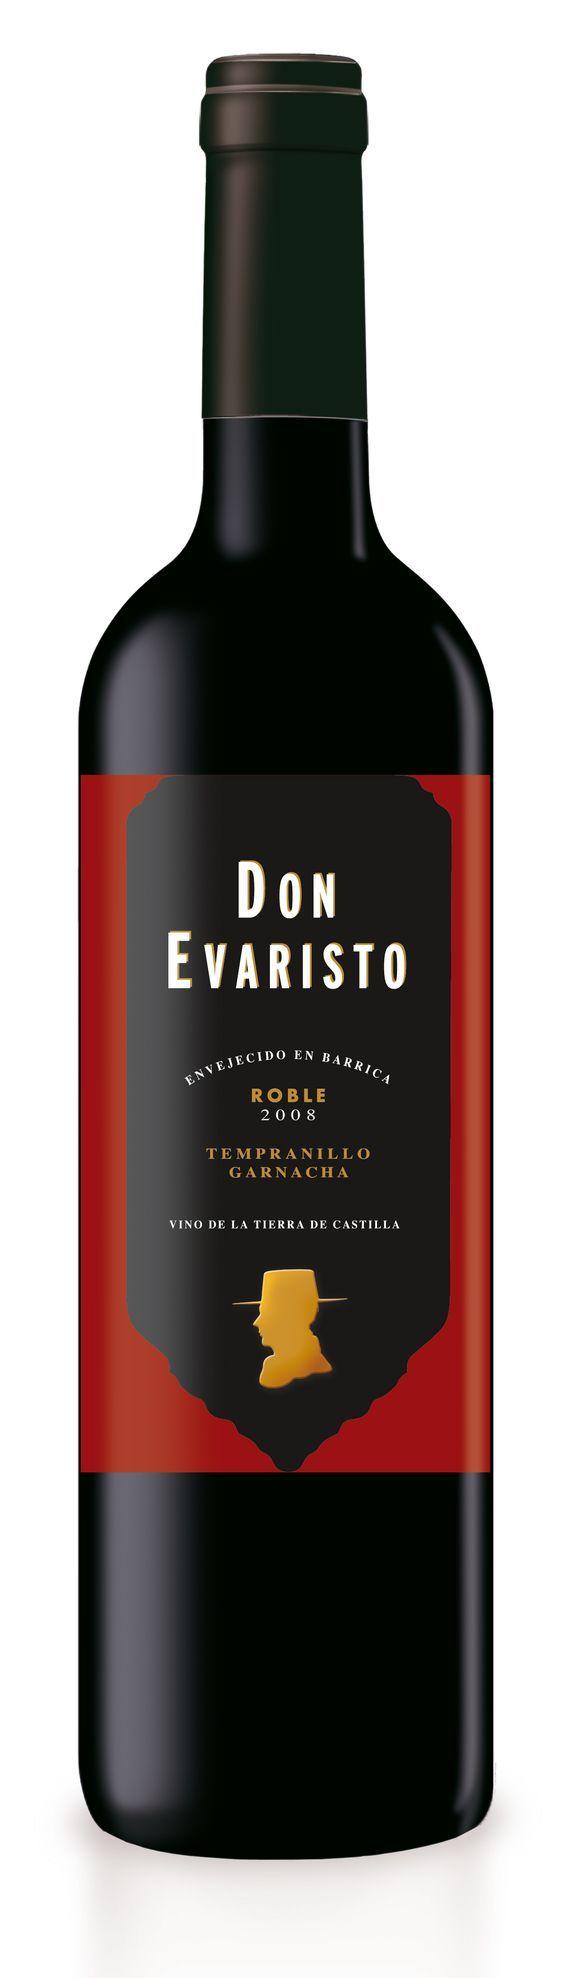 Tinto Roble • Vino de la Tierra de Castilla. Classic Red Wine Design.